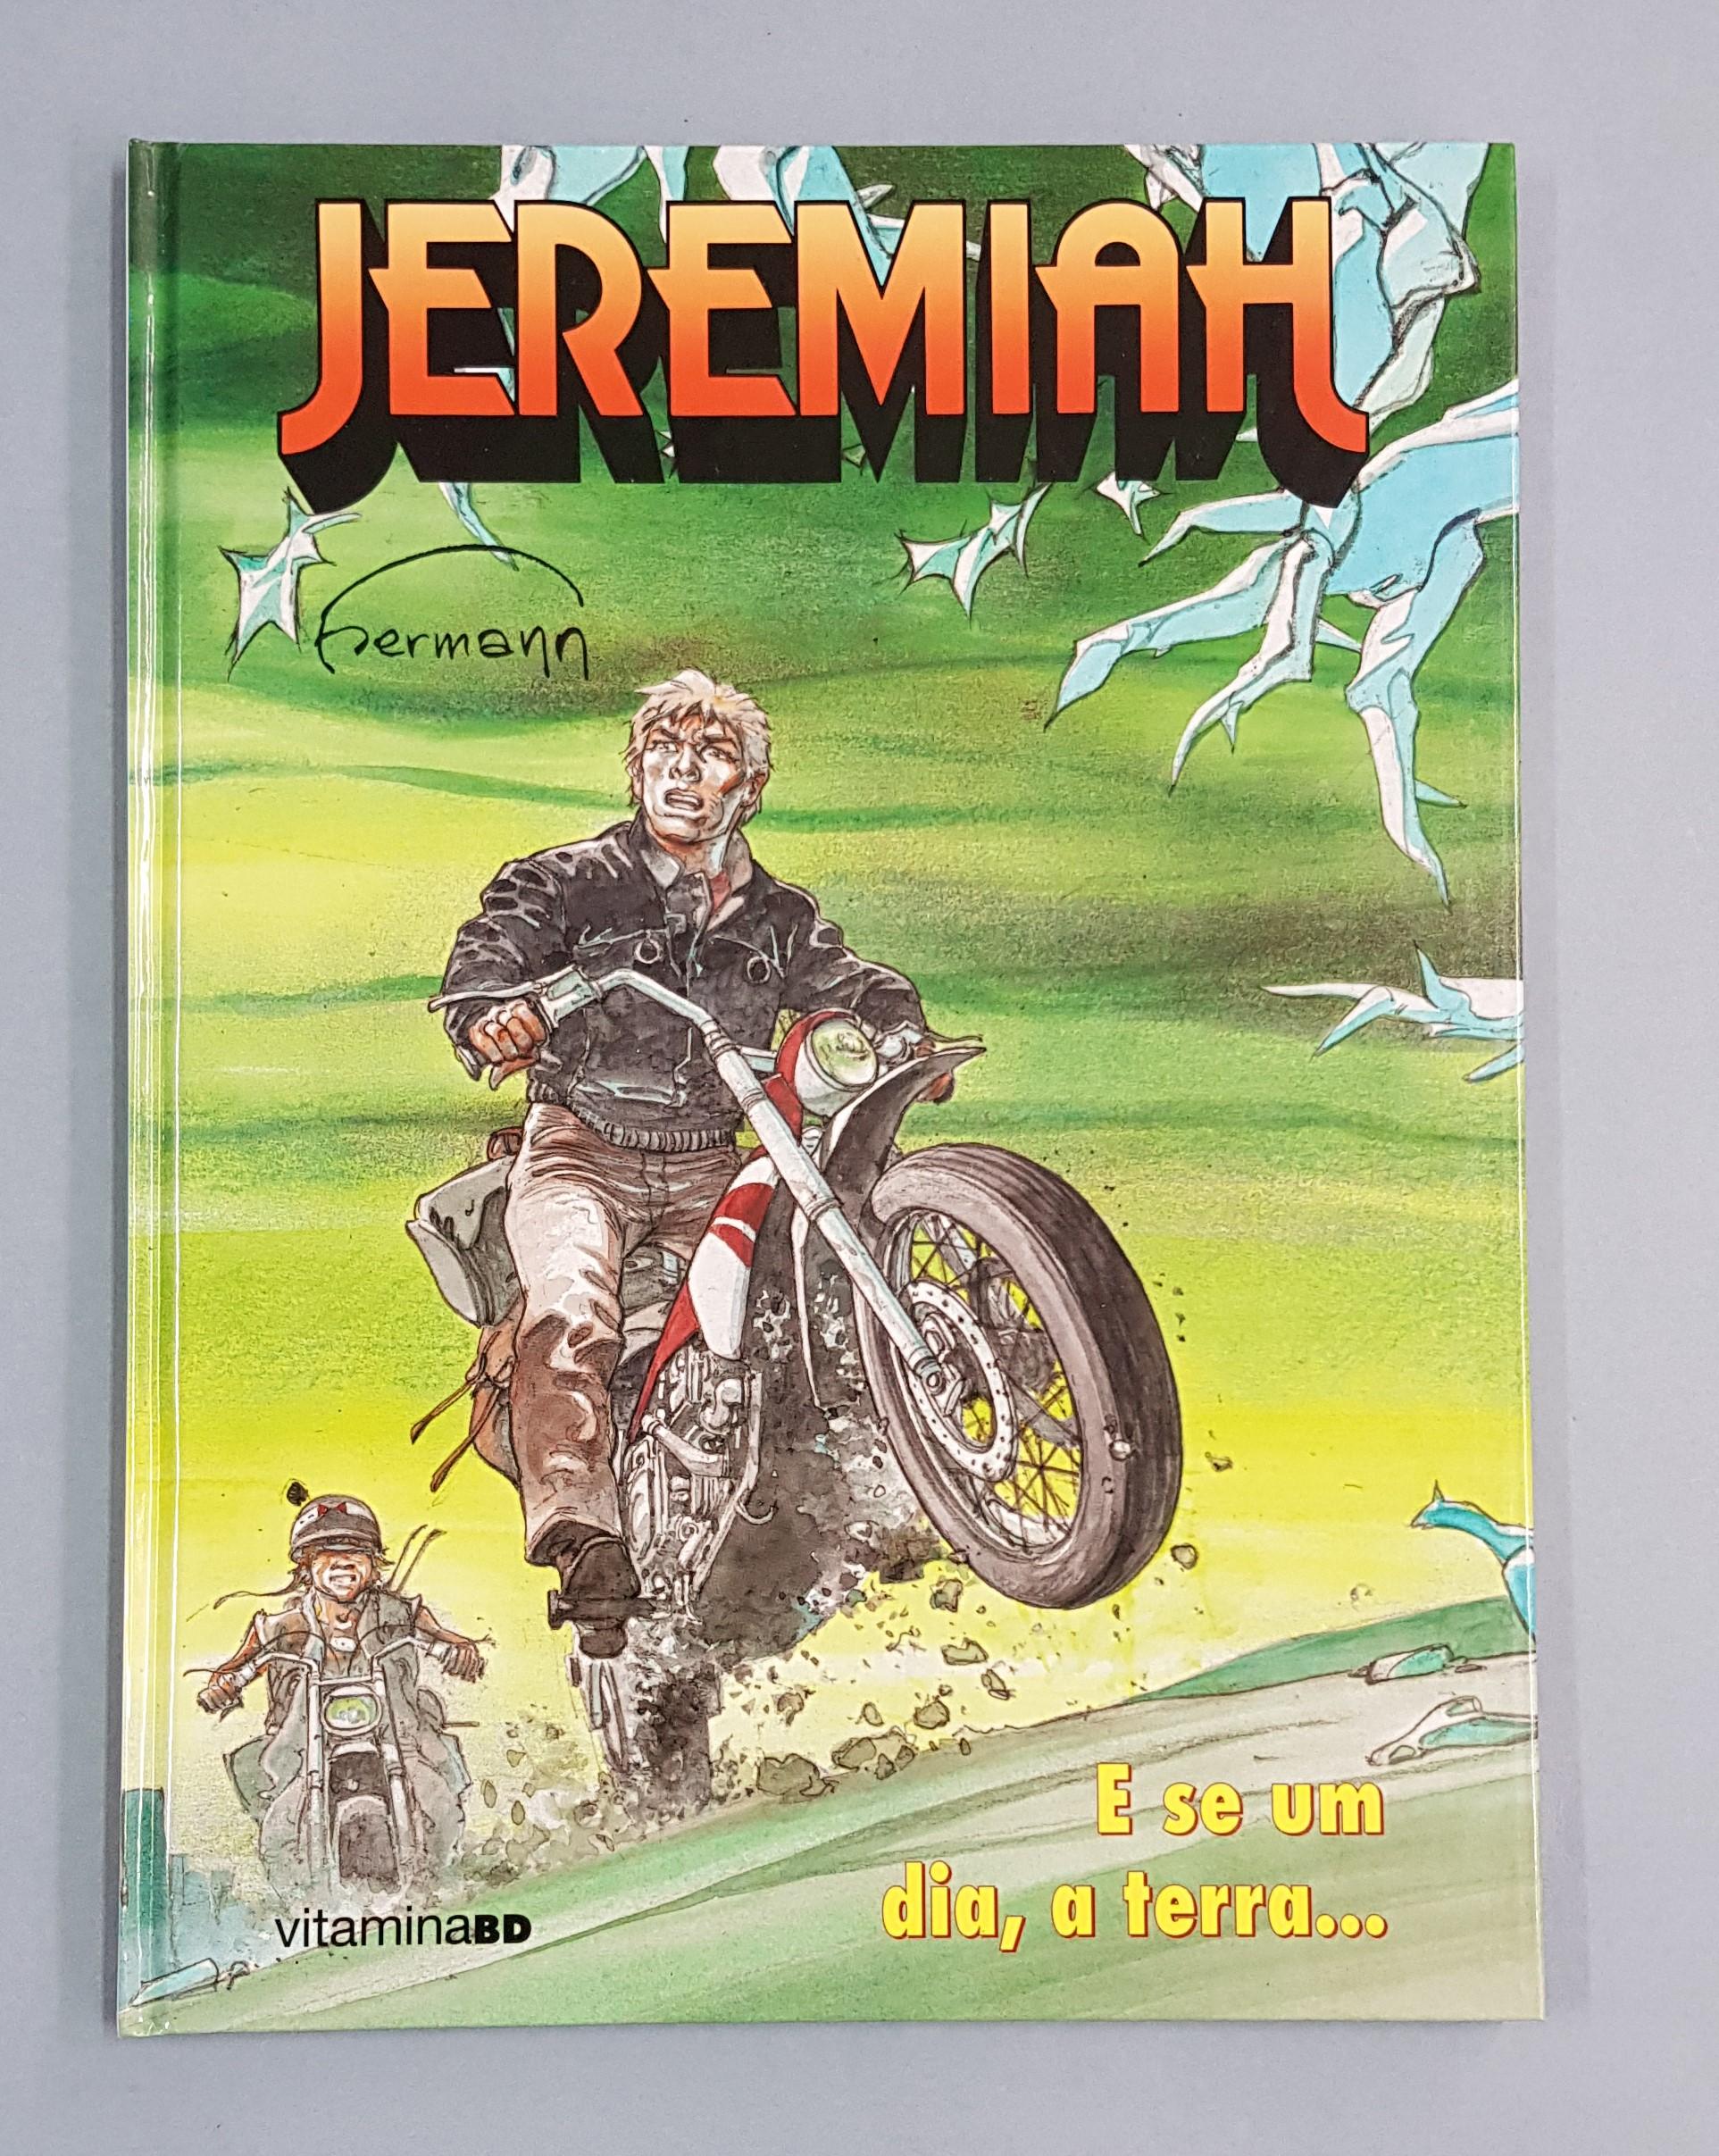 JEREMIAH – E SE UM DIA, A TERRA…